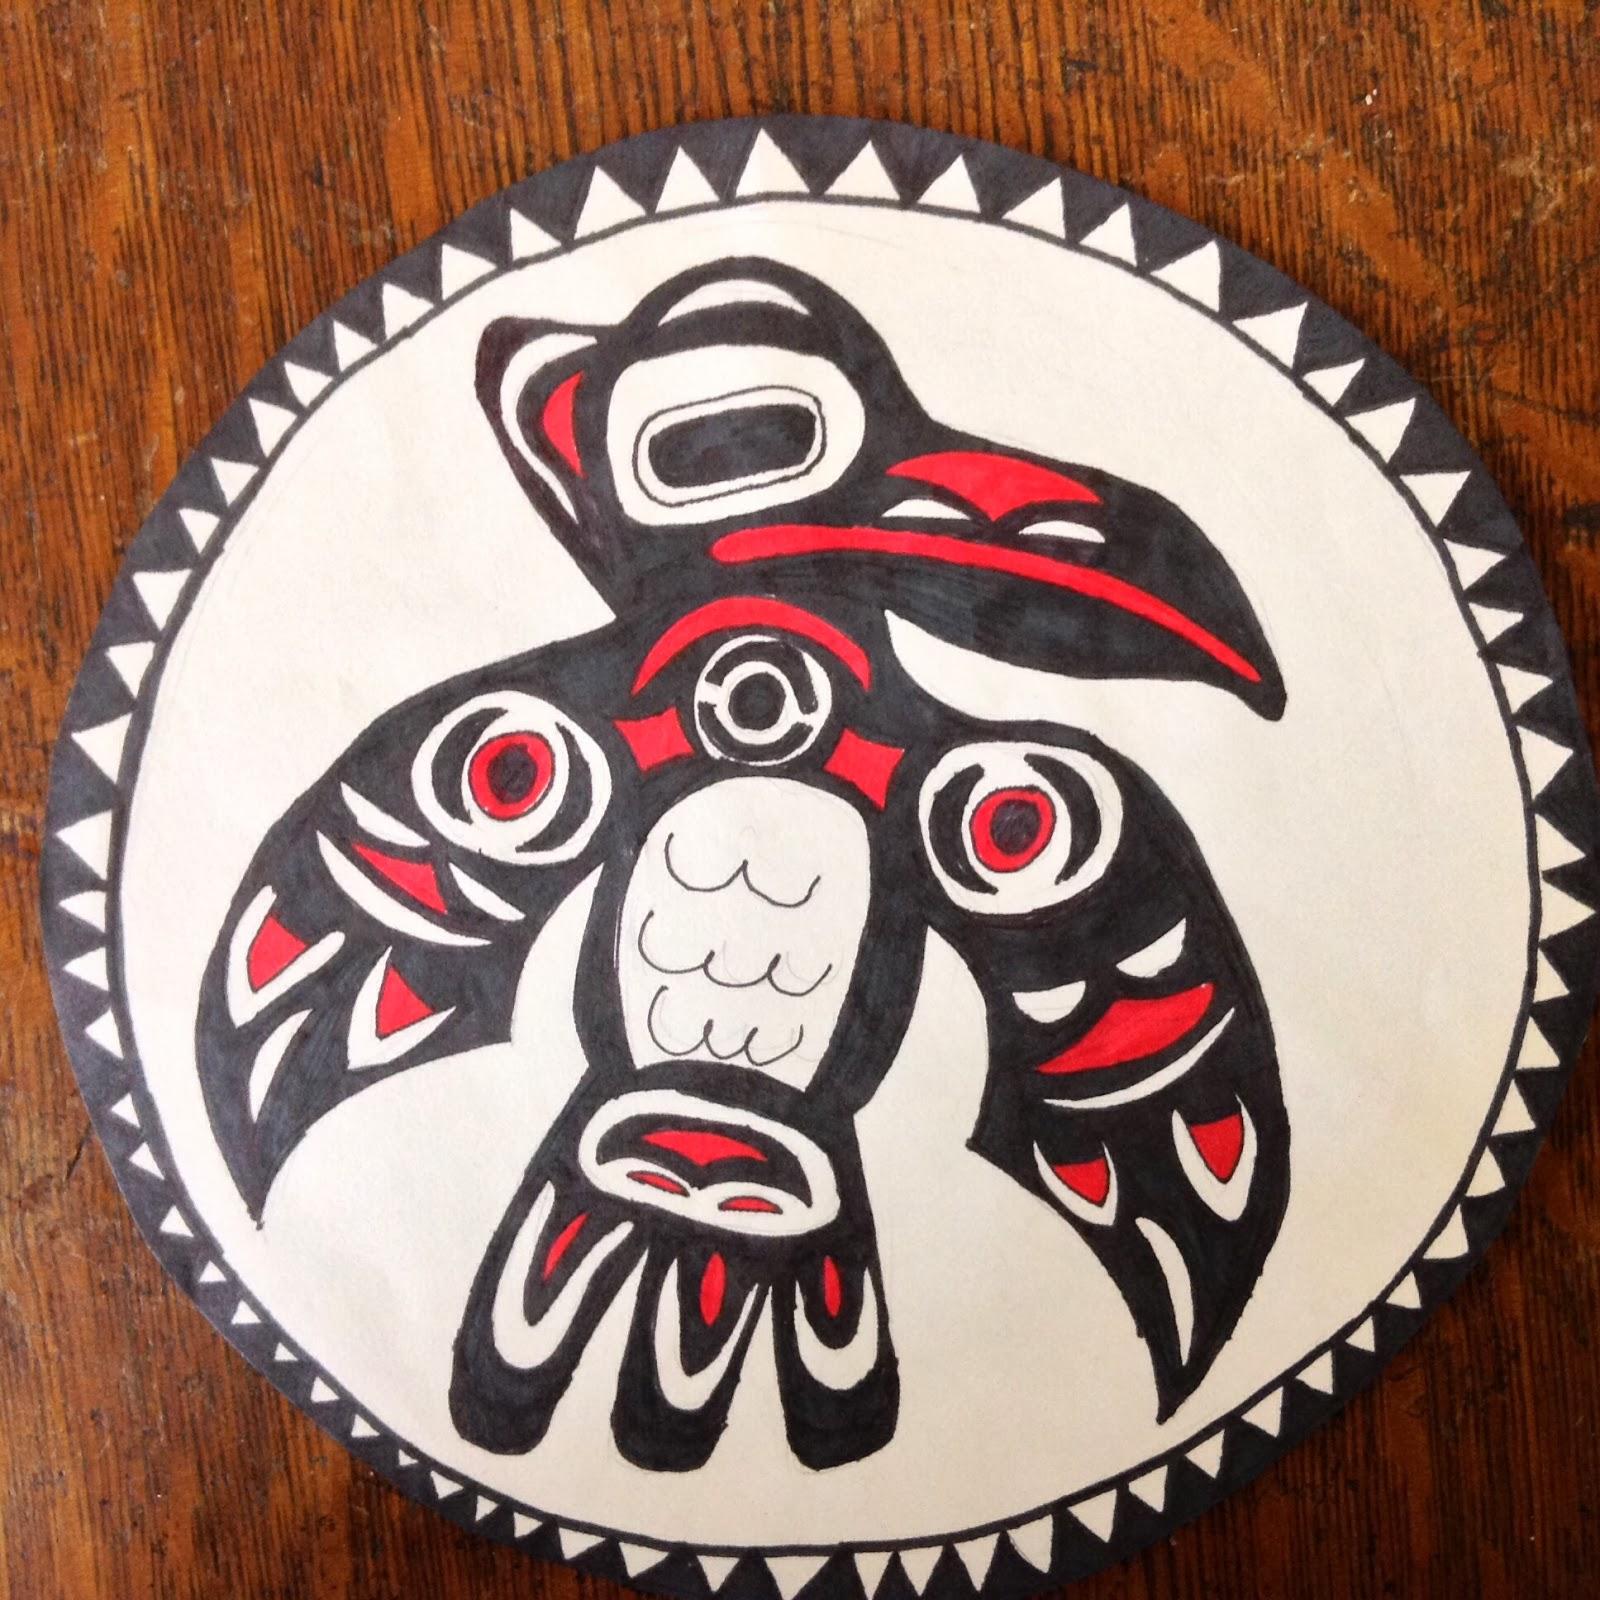 Artisan Des Arts Aboriginalnative American Inspired Art Grade 6